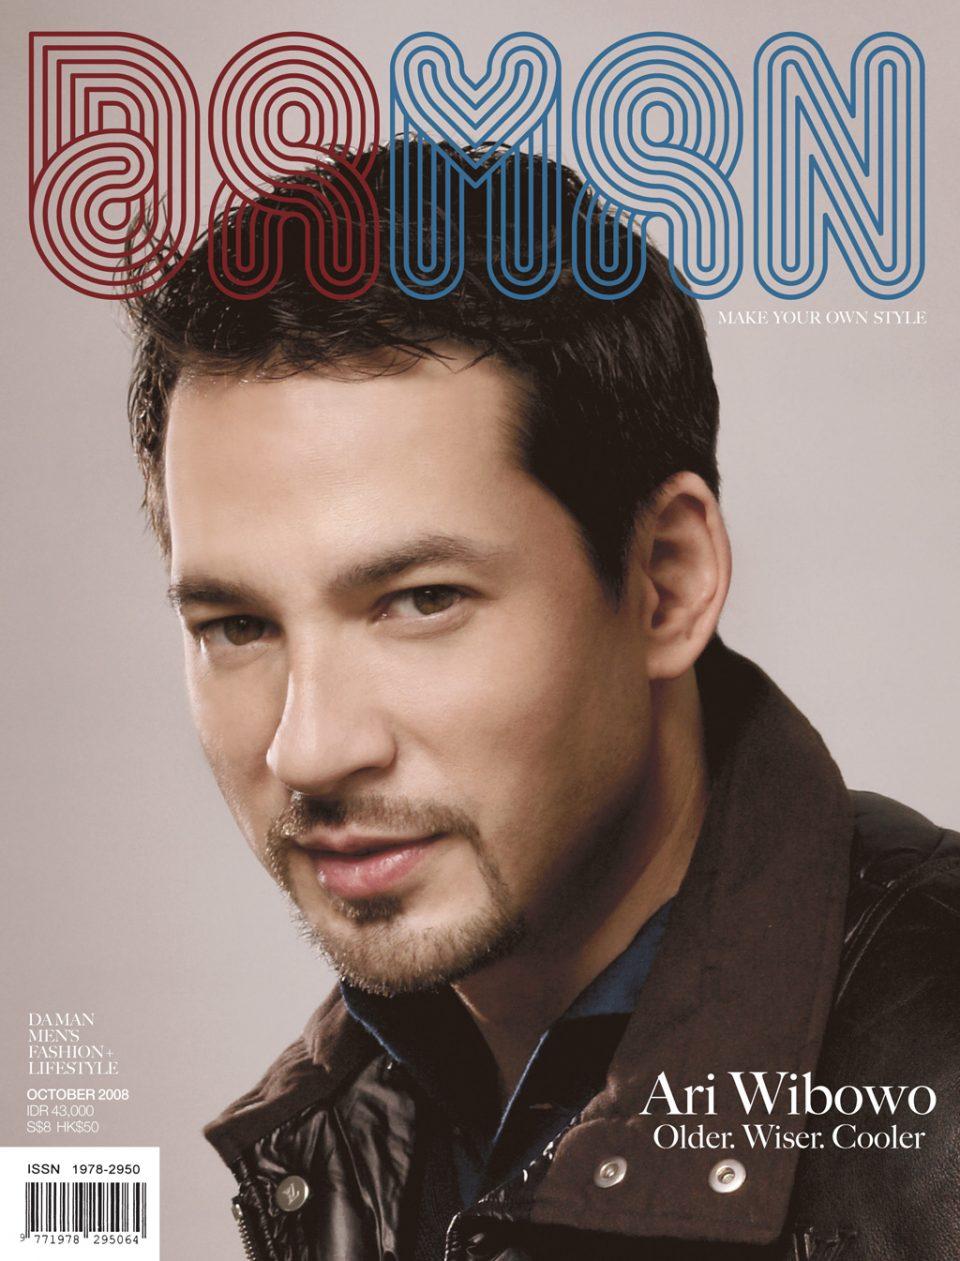 Cover DA MAN Oct 2008